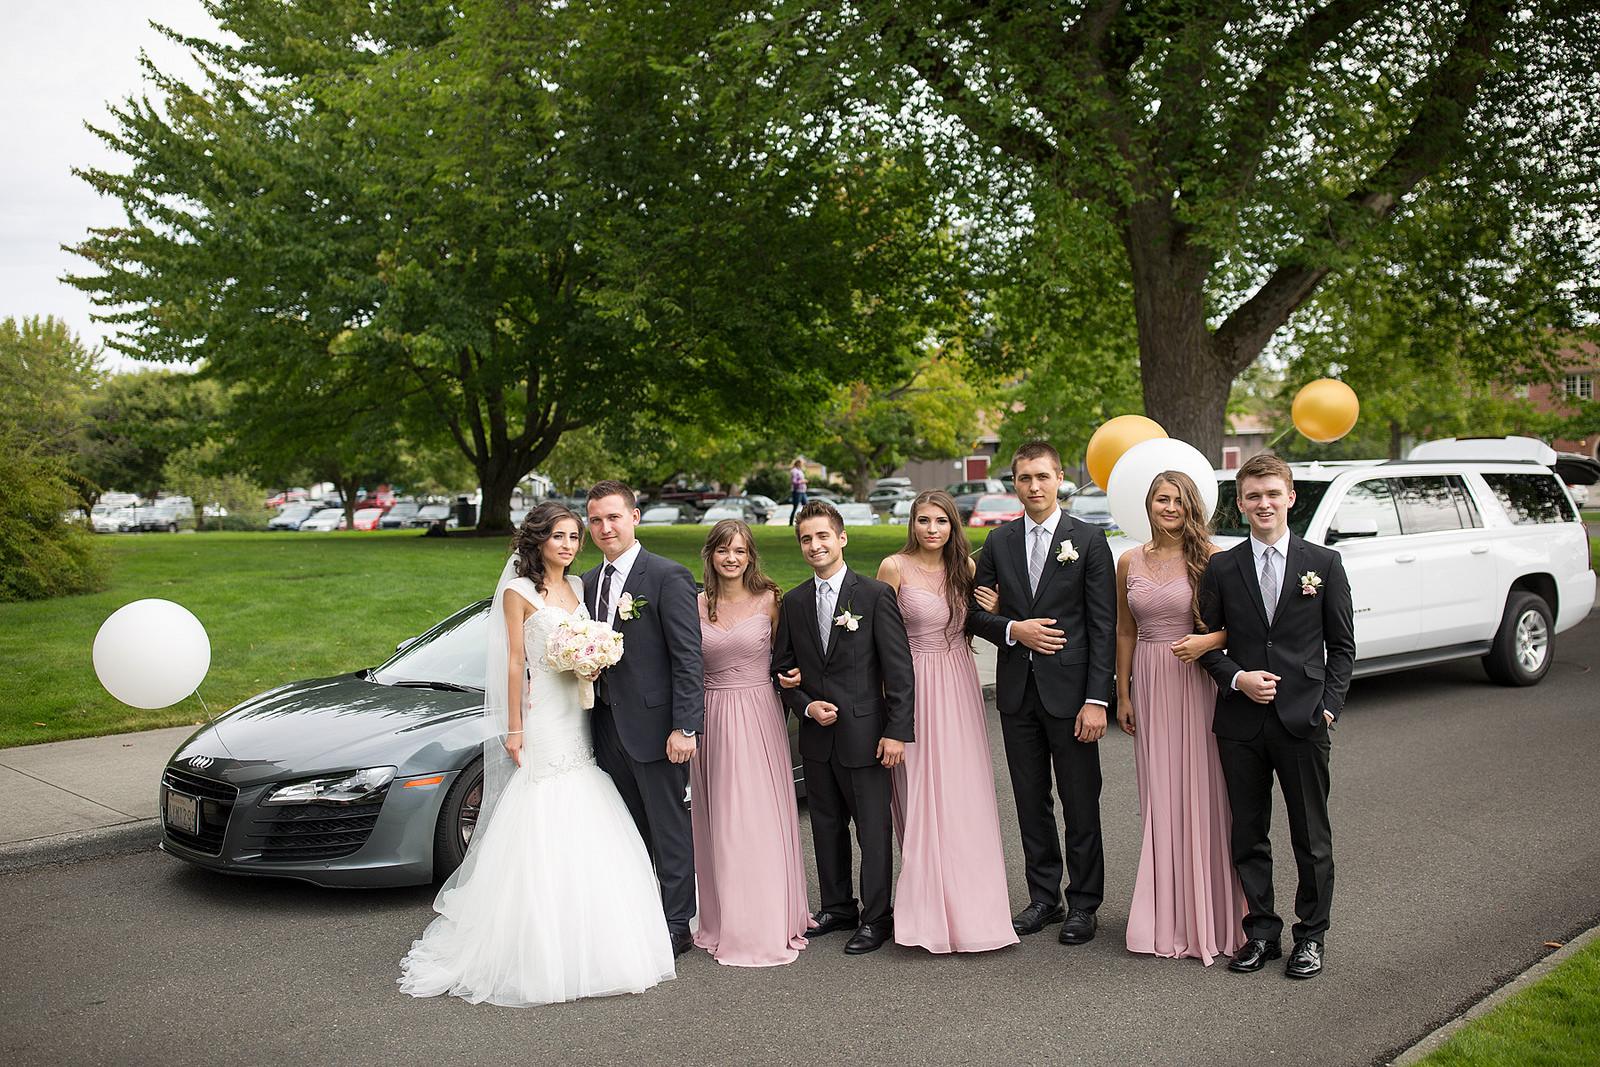 real, wedding, bride, bridal, fashion, style, bridesmaids, groomsmen, pink, long, dress, affordable